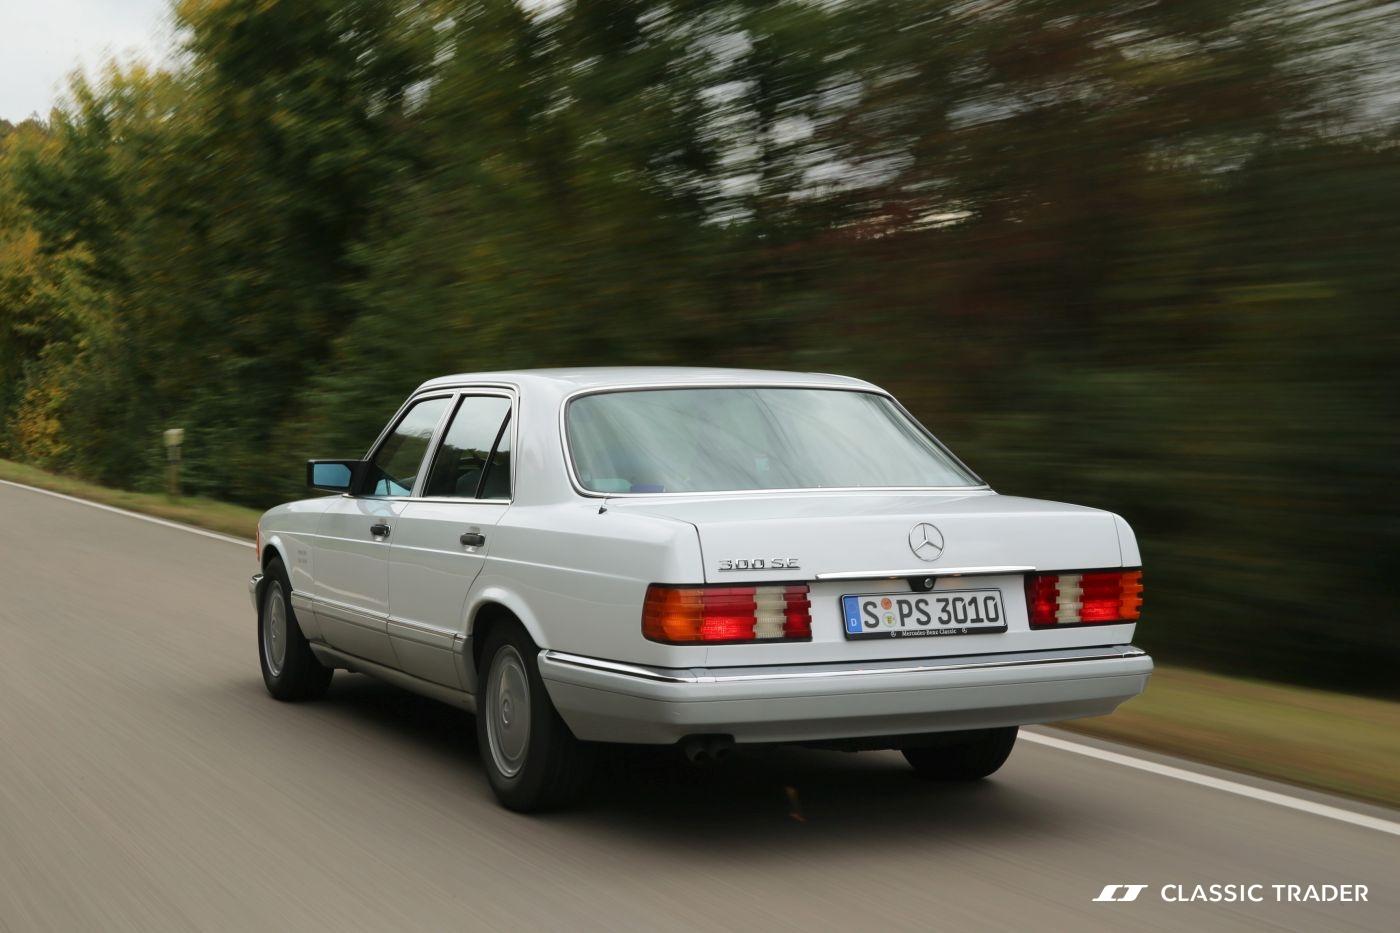 Mercedes-Benz W 126 S Klasse 300 SE 1990 Heck (9)